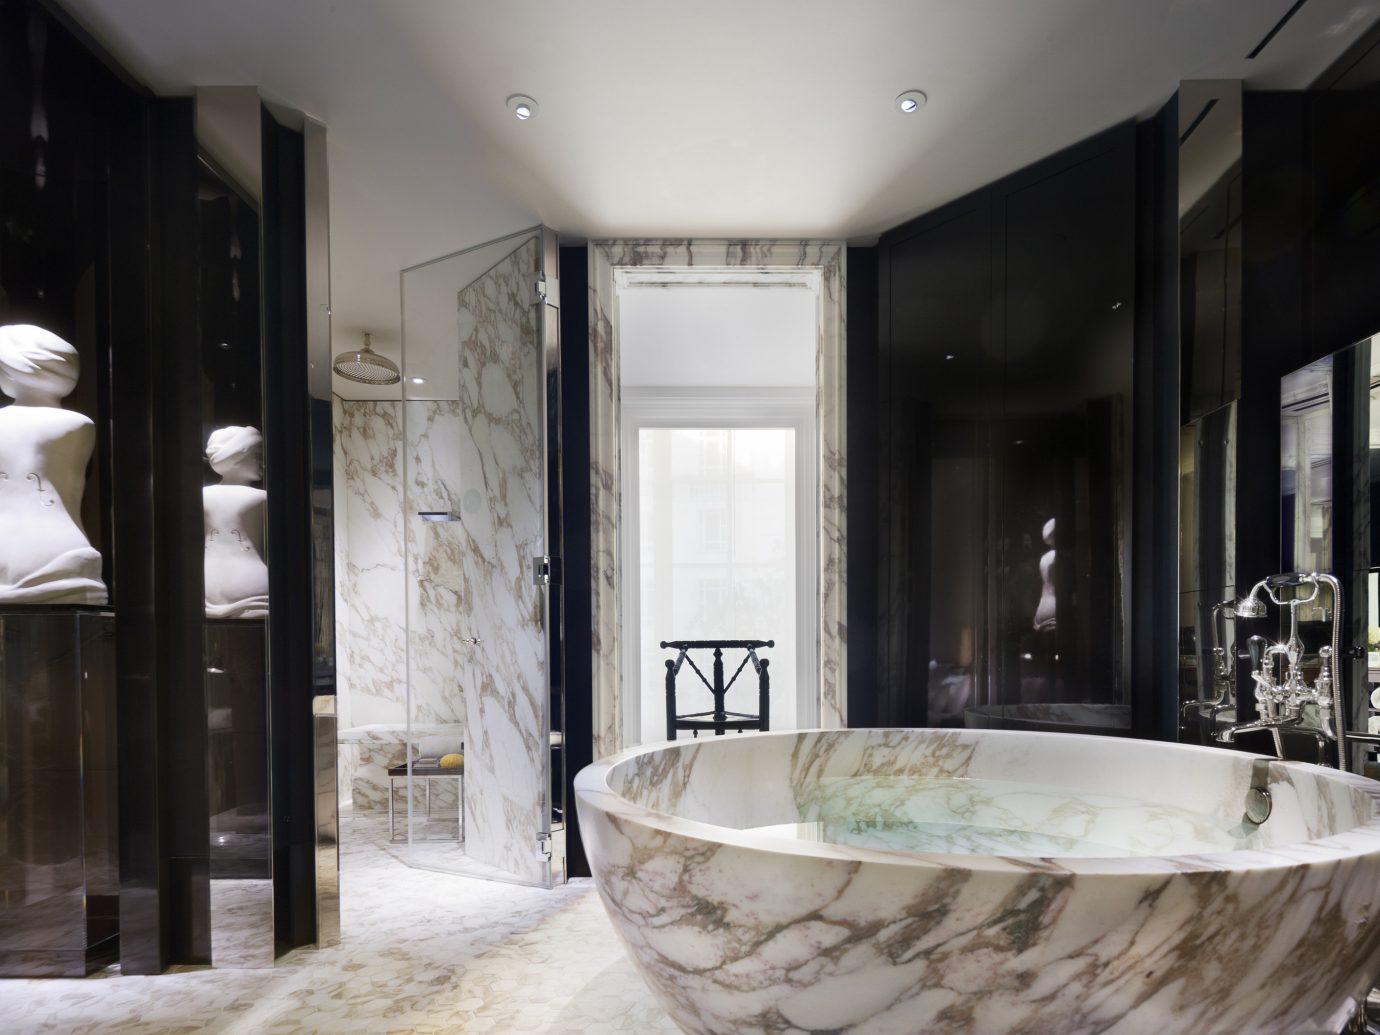 Hotels Luxury Travel indoor window room bathroom interior design home estate sink bathtub interior designer tub Bath